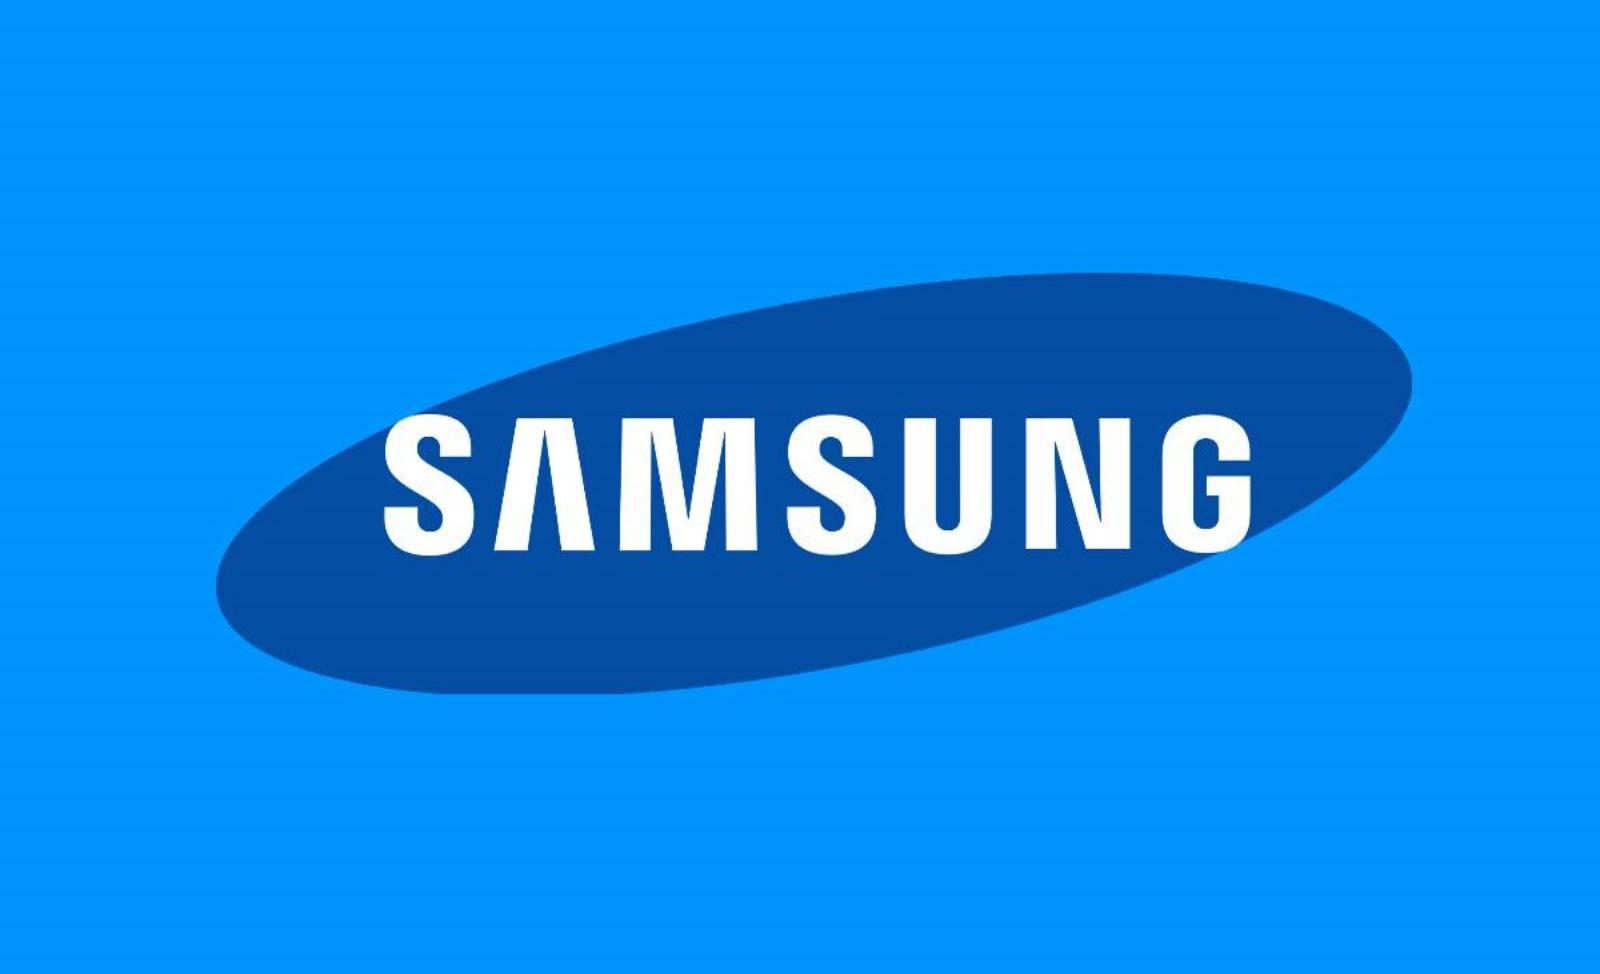 Samsung DEZASTRUL